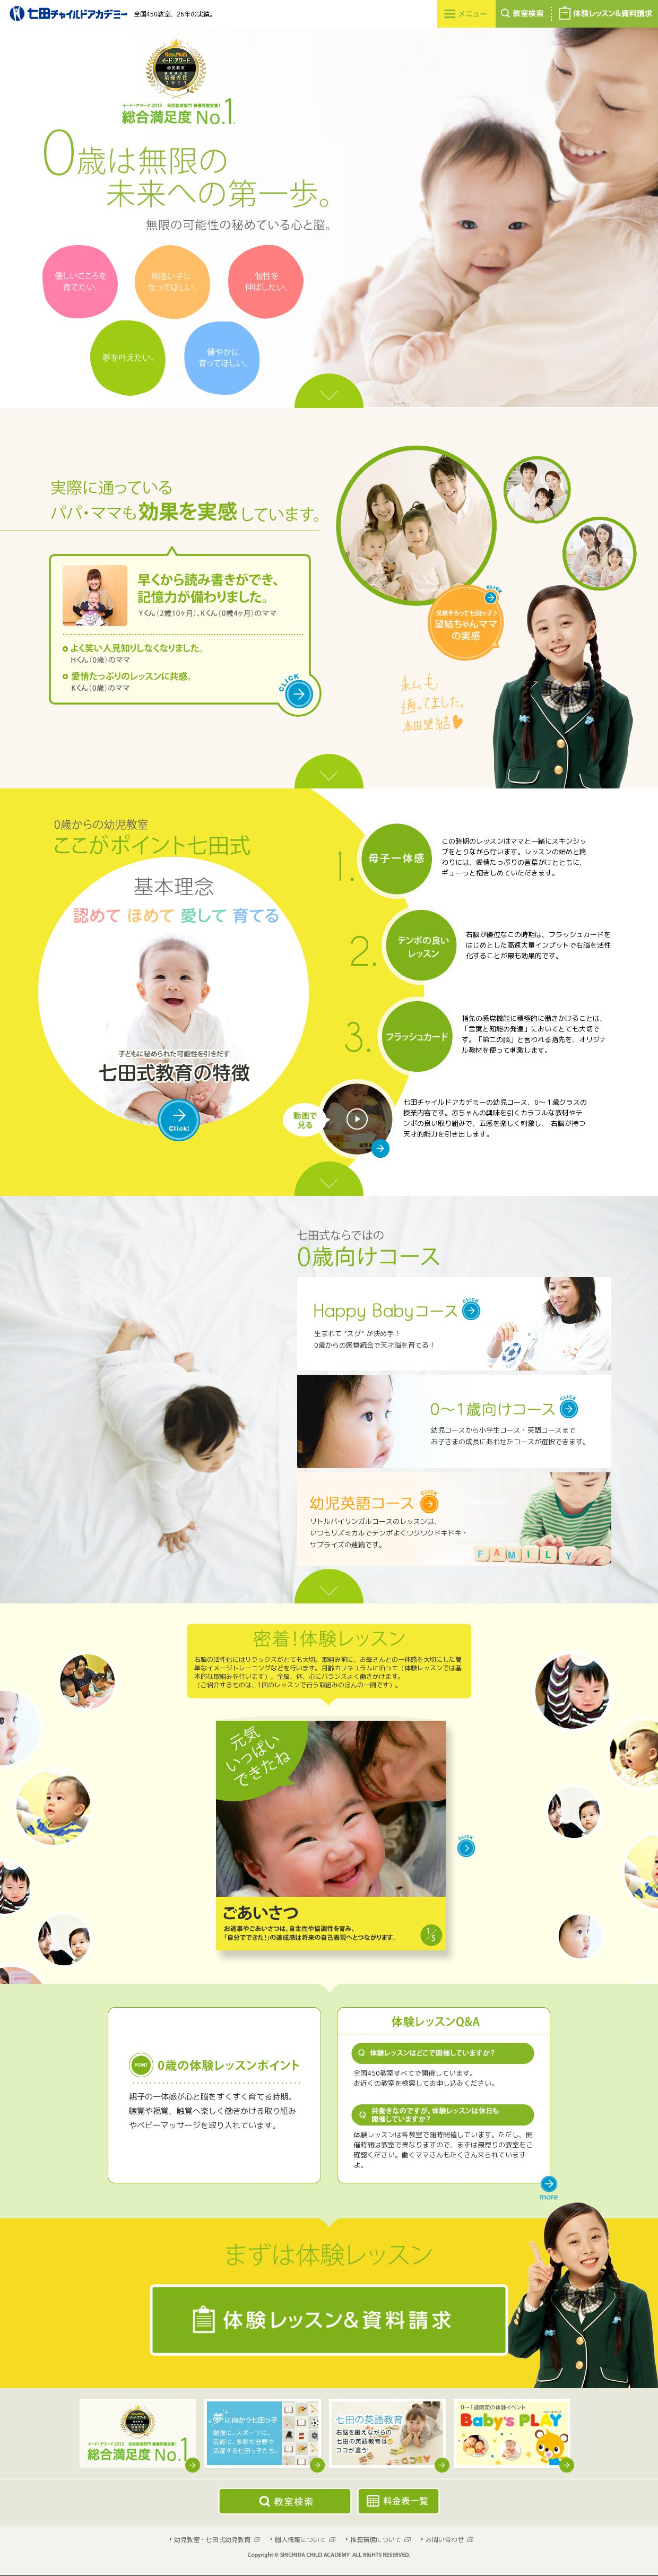 the website http baby shichida ne jp age 0 courtesy of